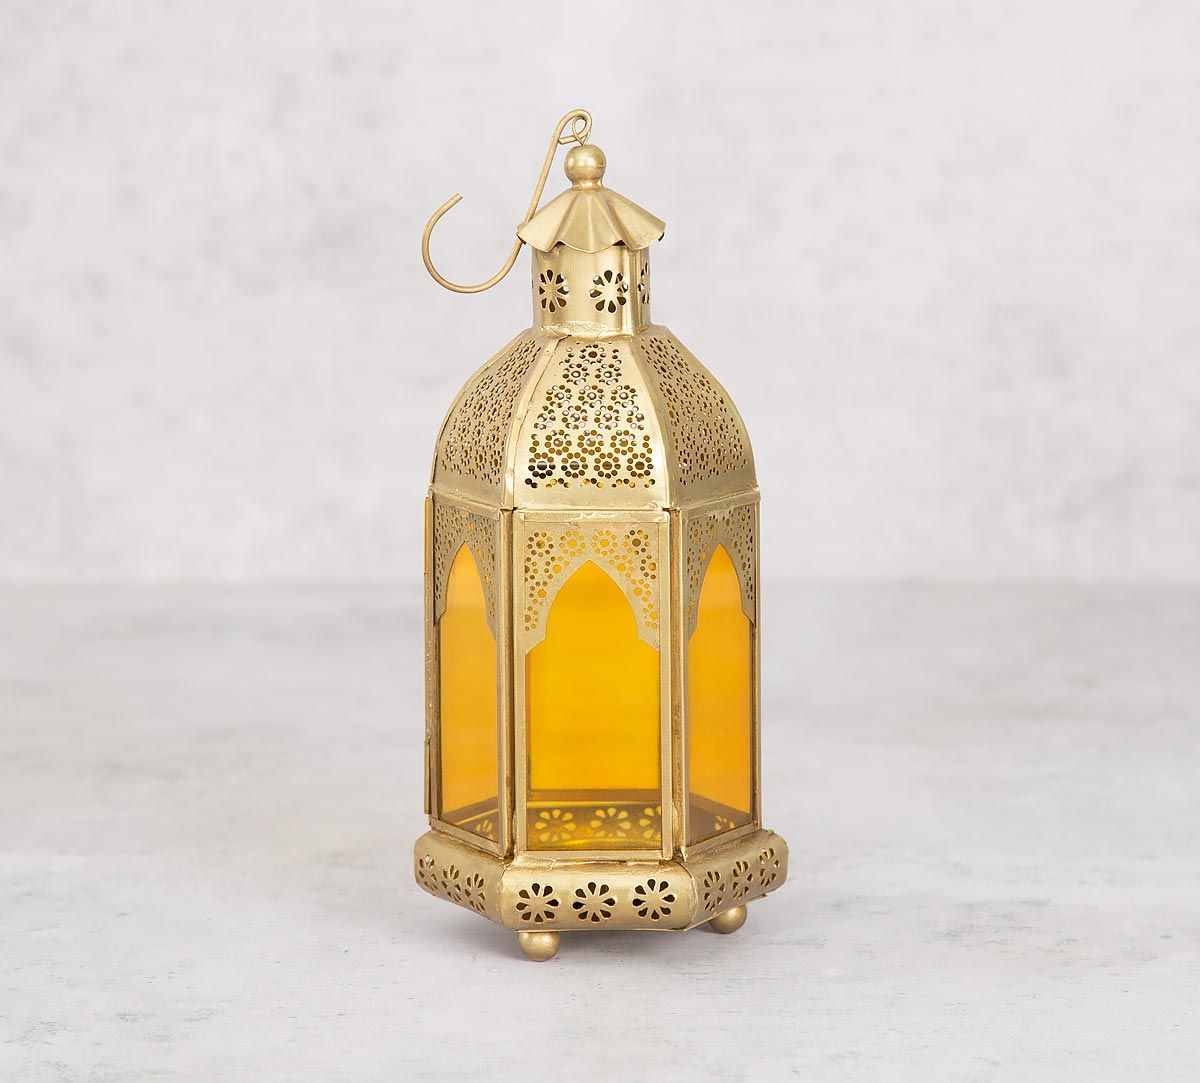 India Circus Gold Rosette Iron Candle Lantern